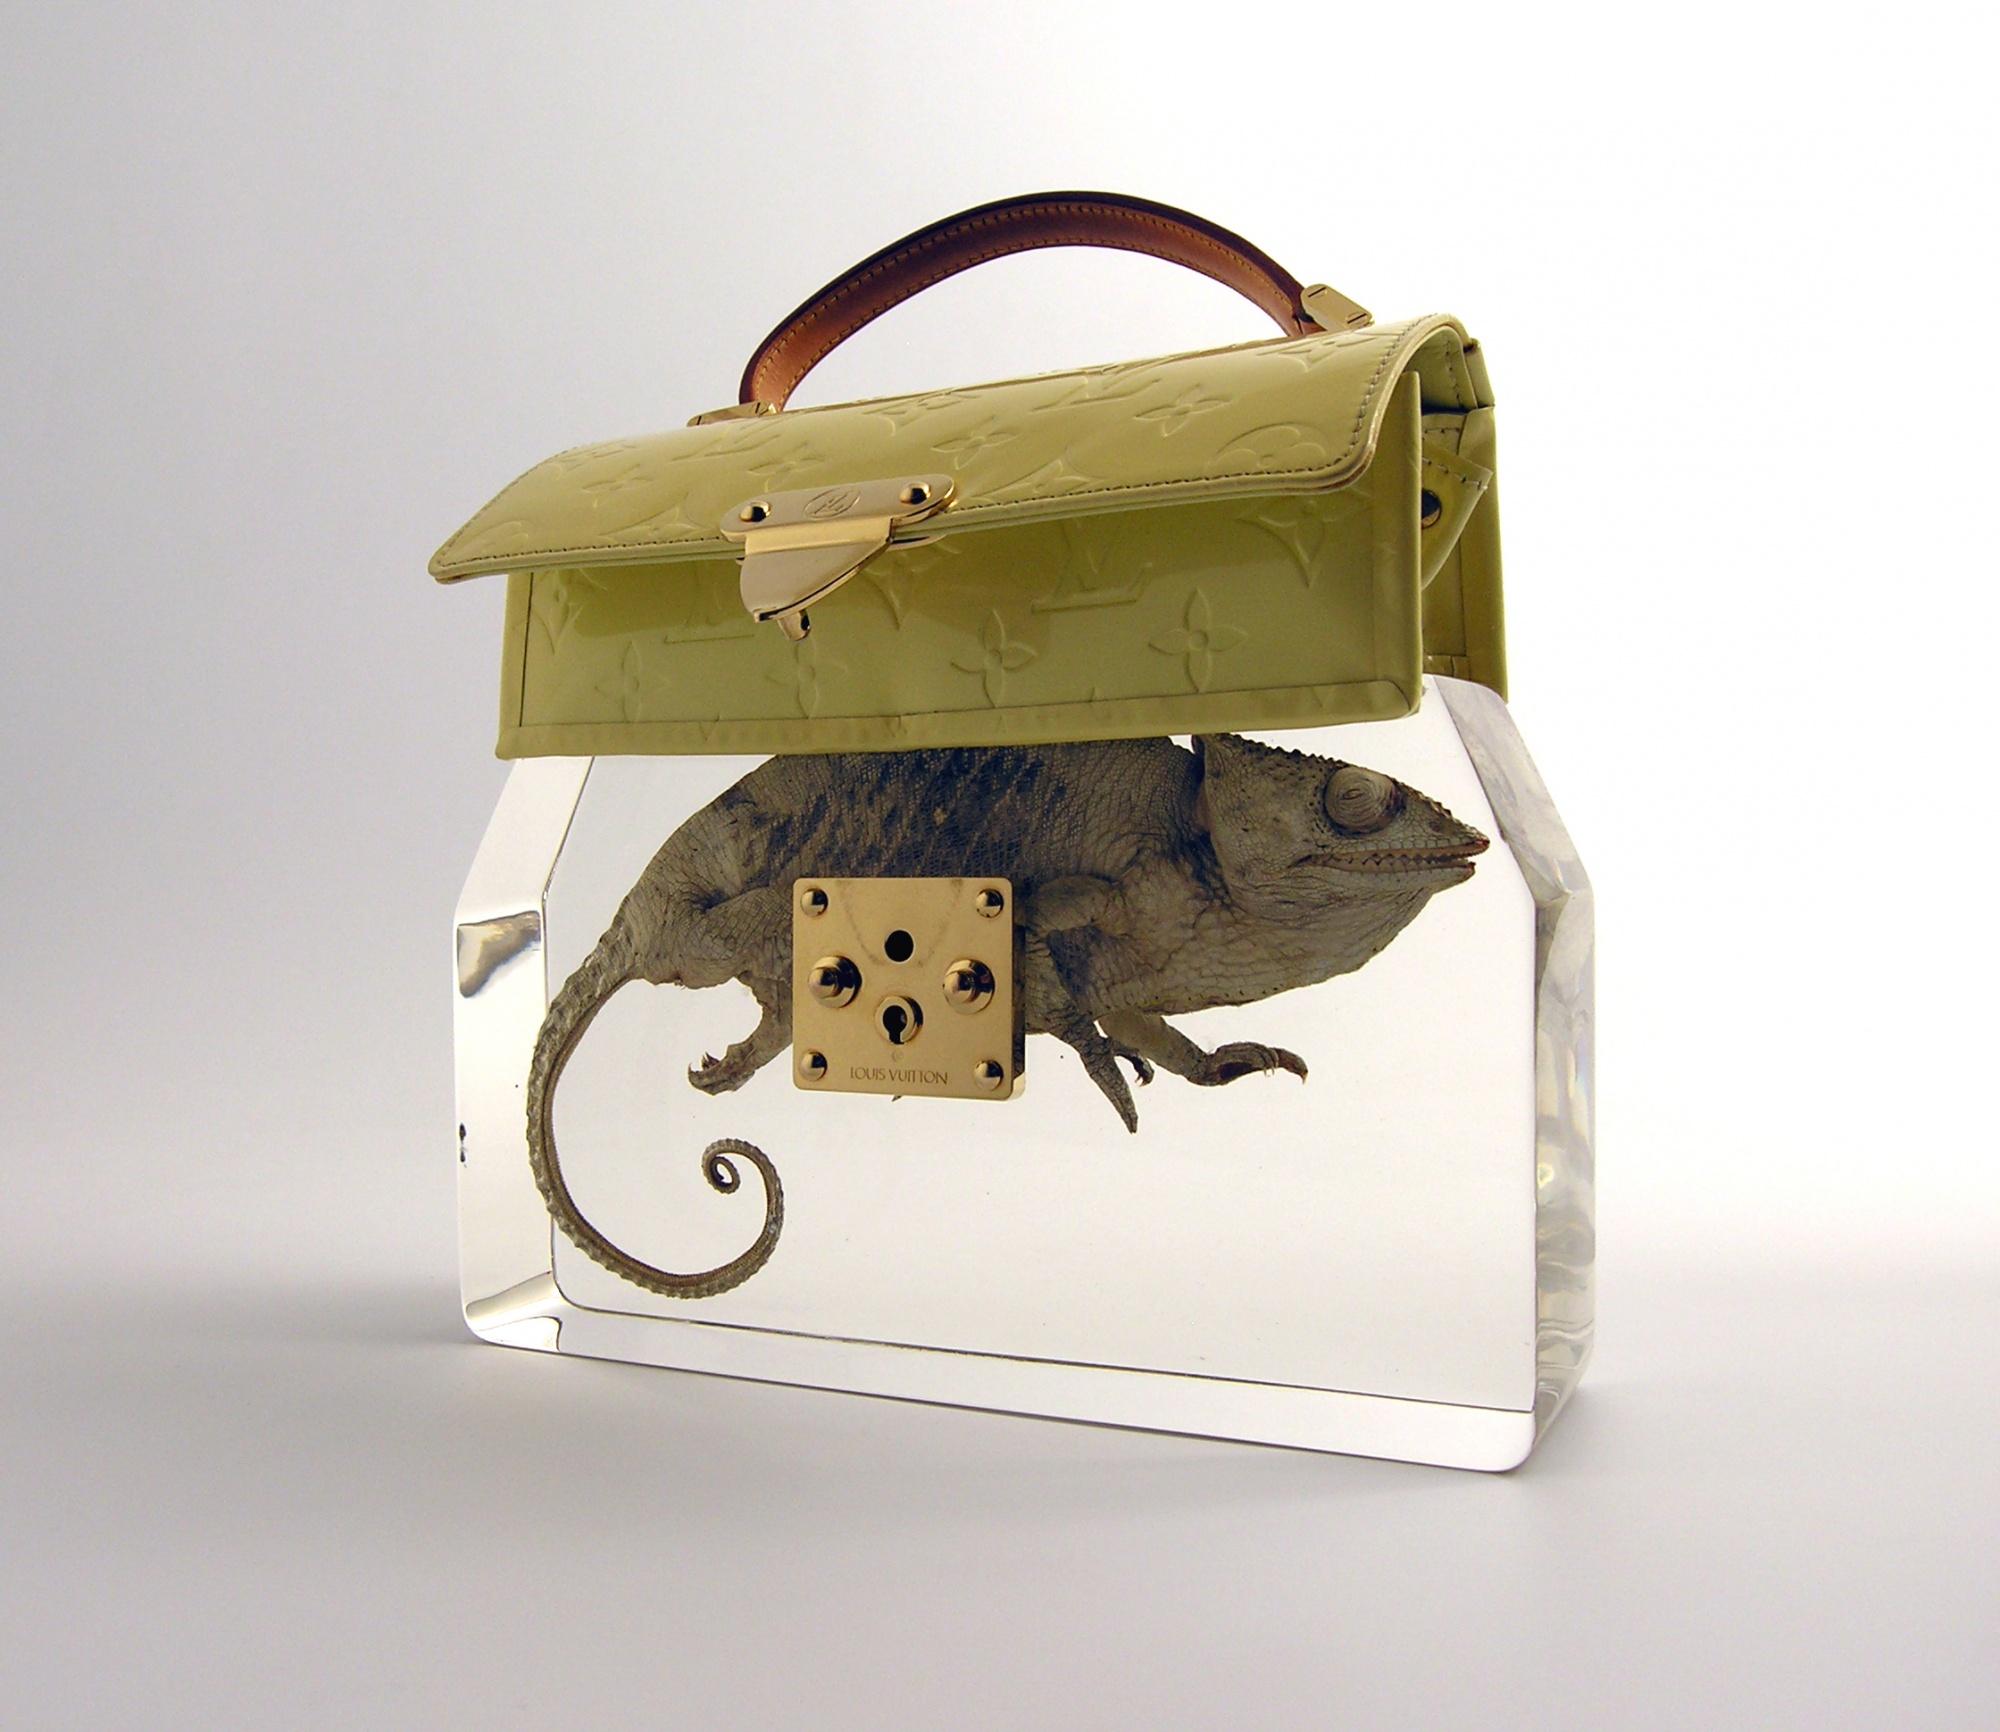 Ted_Noten_Grandma's_Bag_Revisited_2009